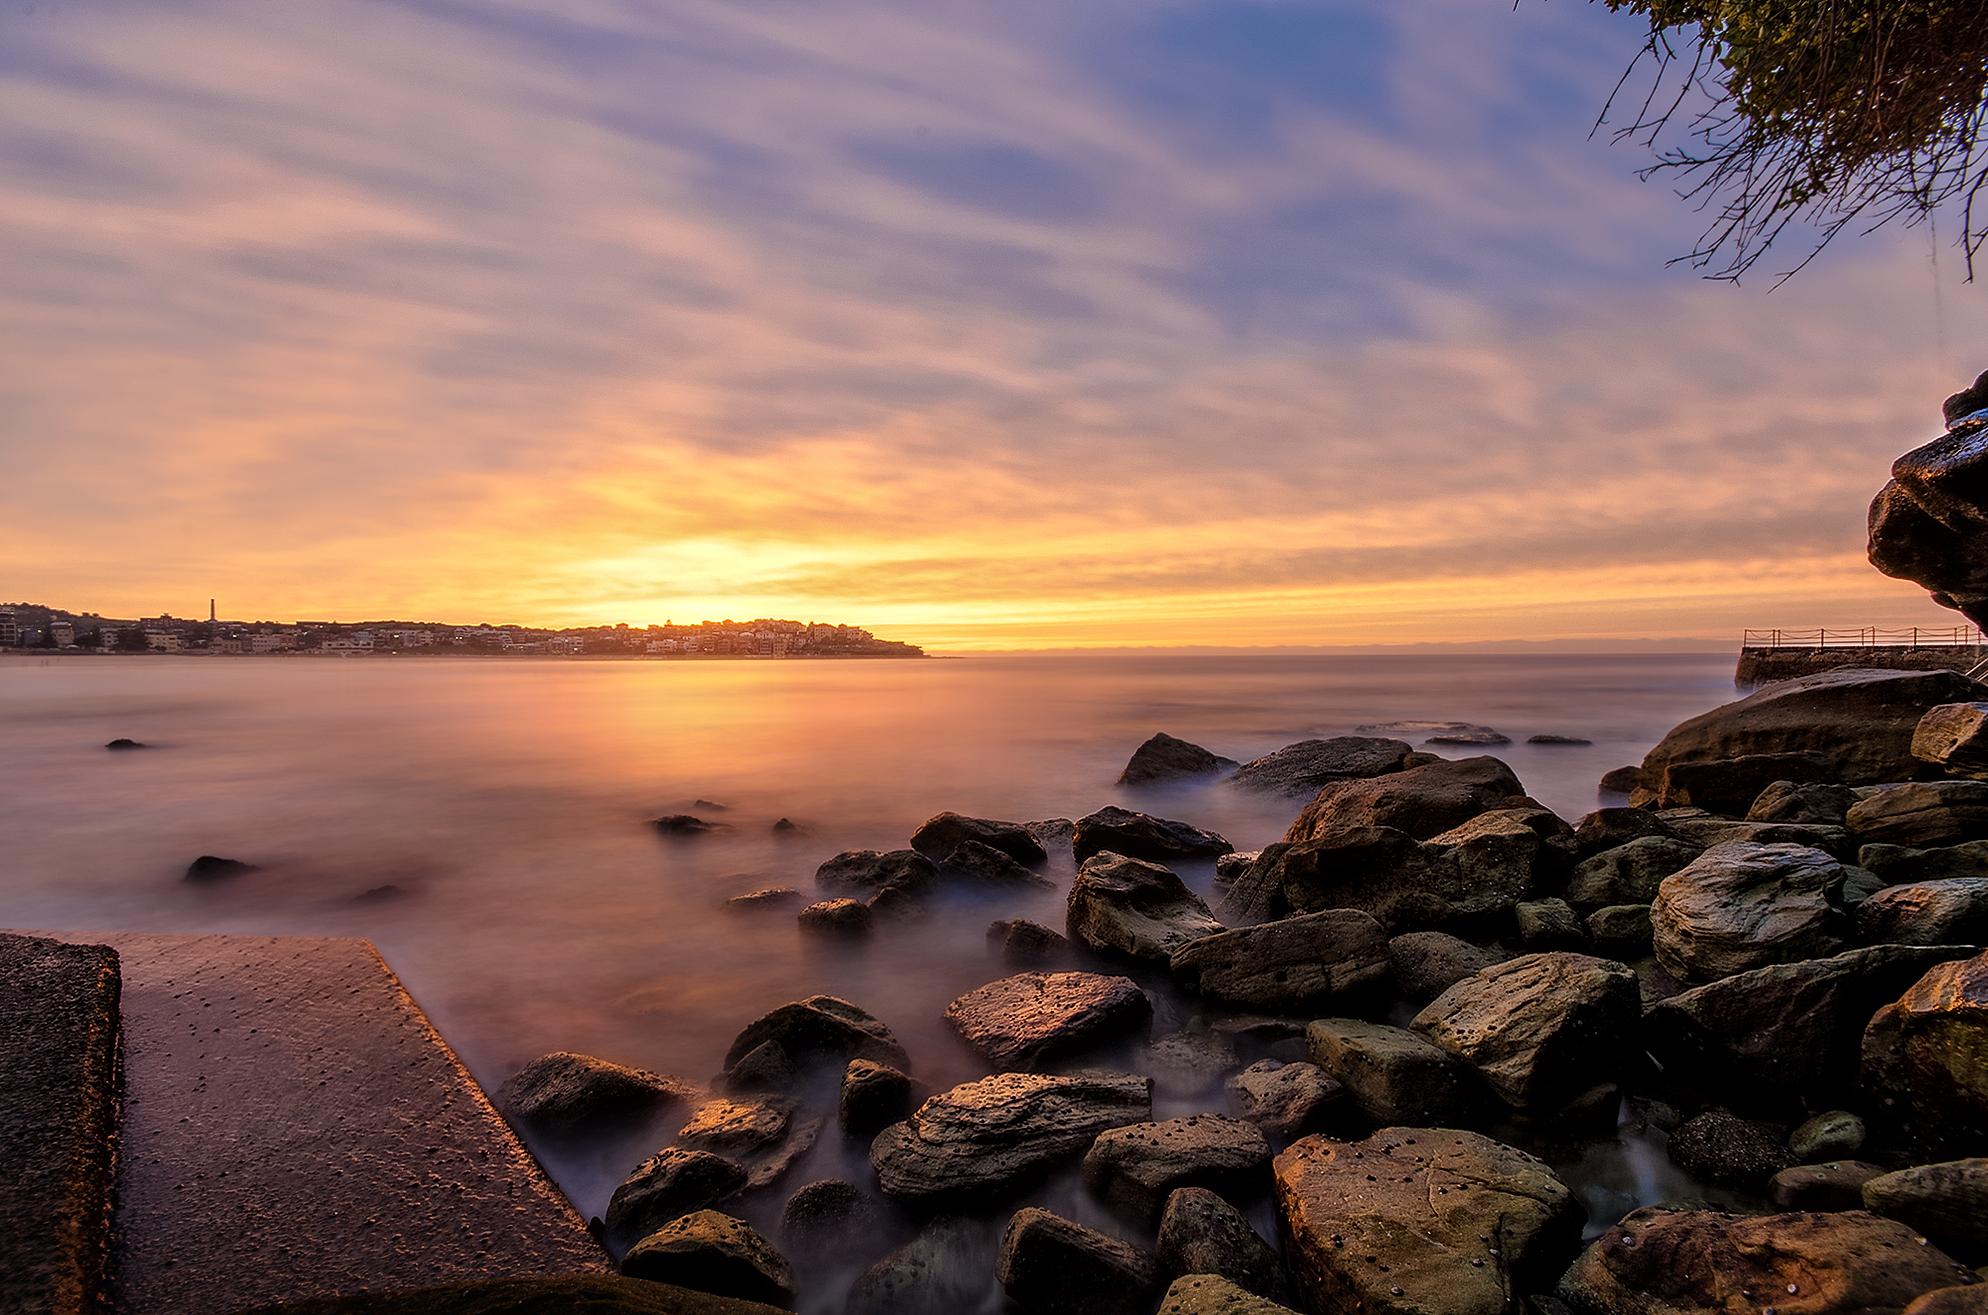 Sunrise at Bondi Beach, NSW